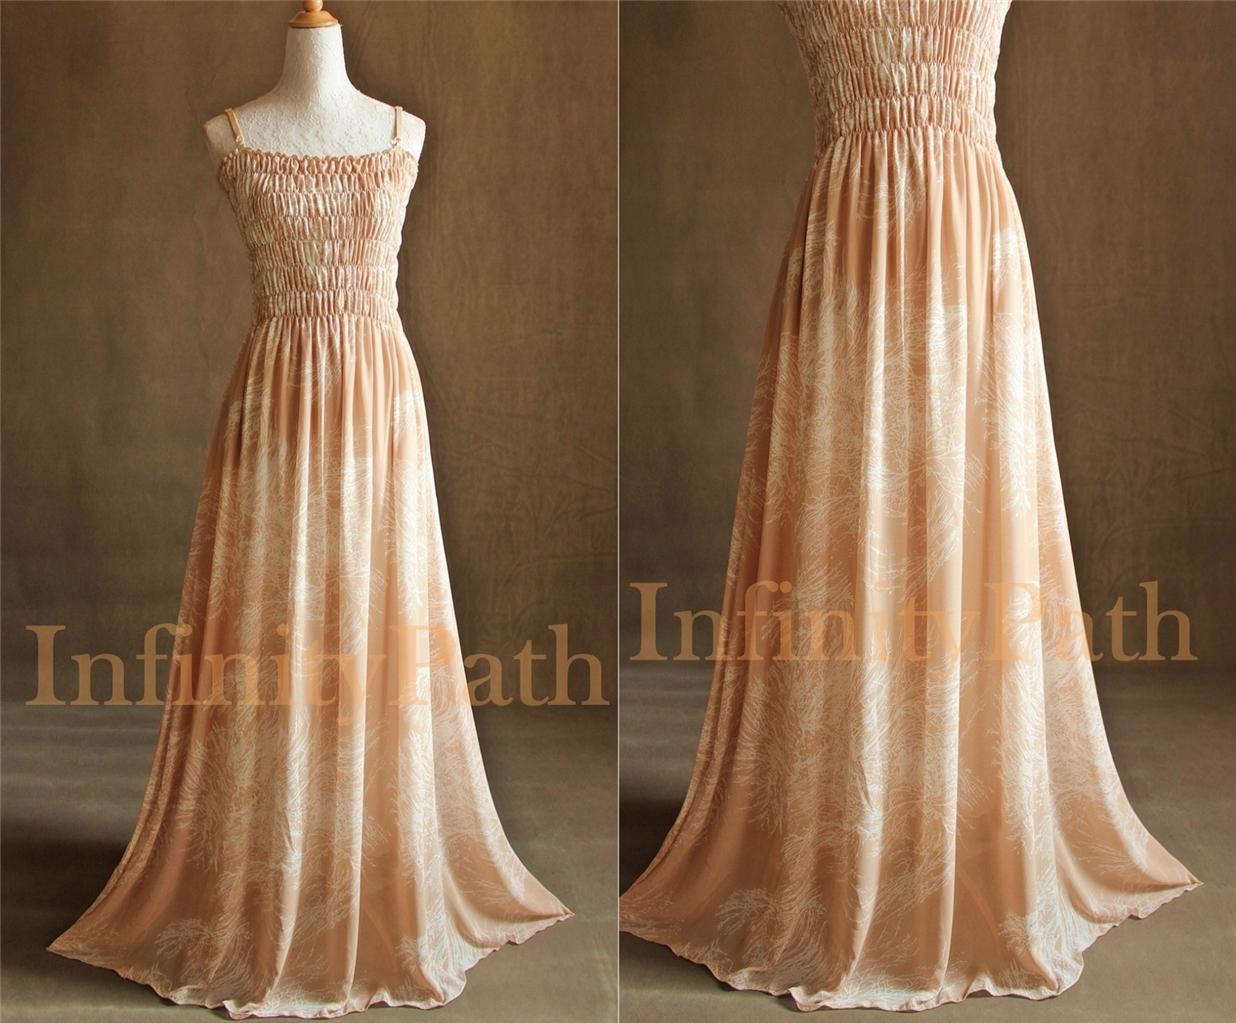 Beige Plus Size Xl 4x Extra Long Woman Maxi Wedding Bride